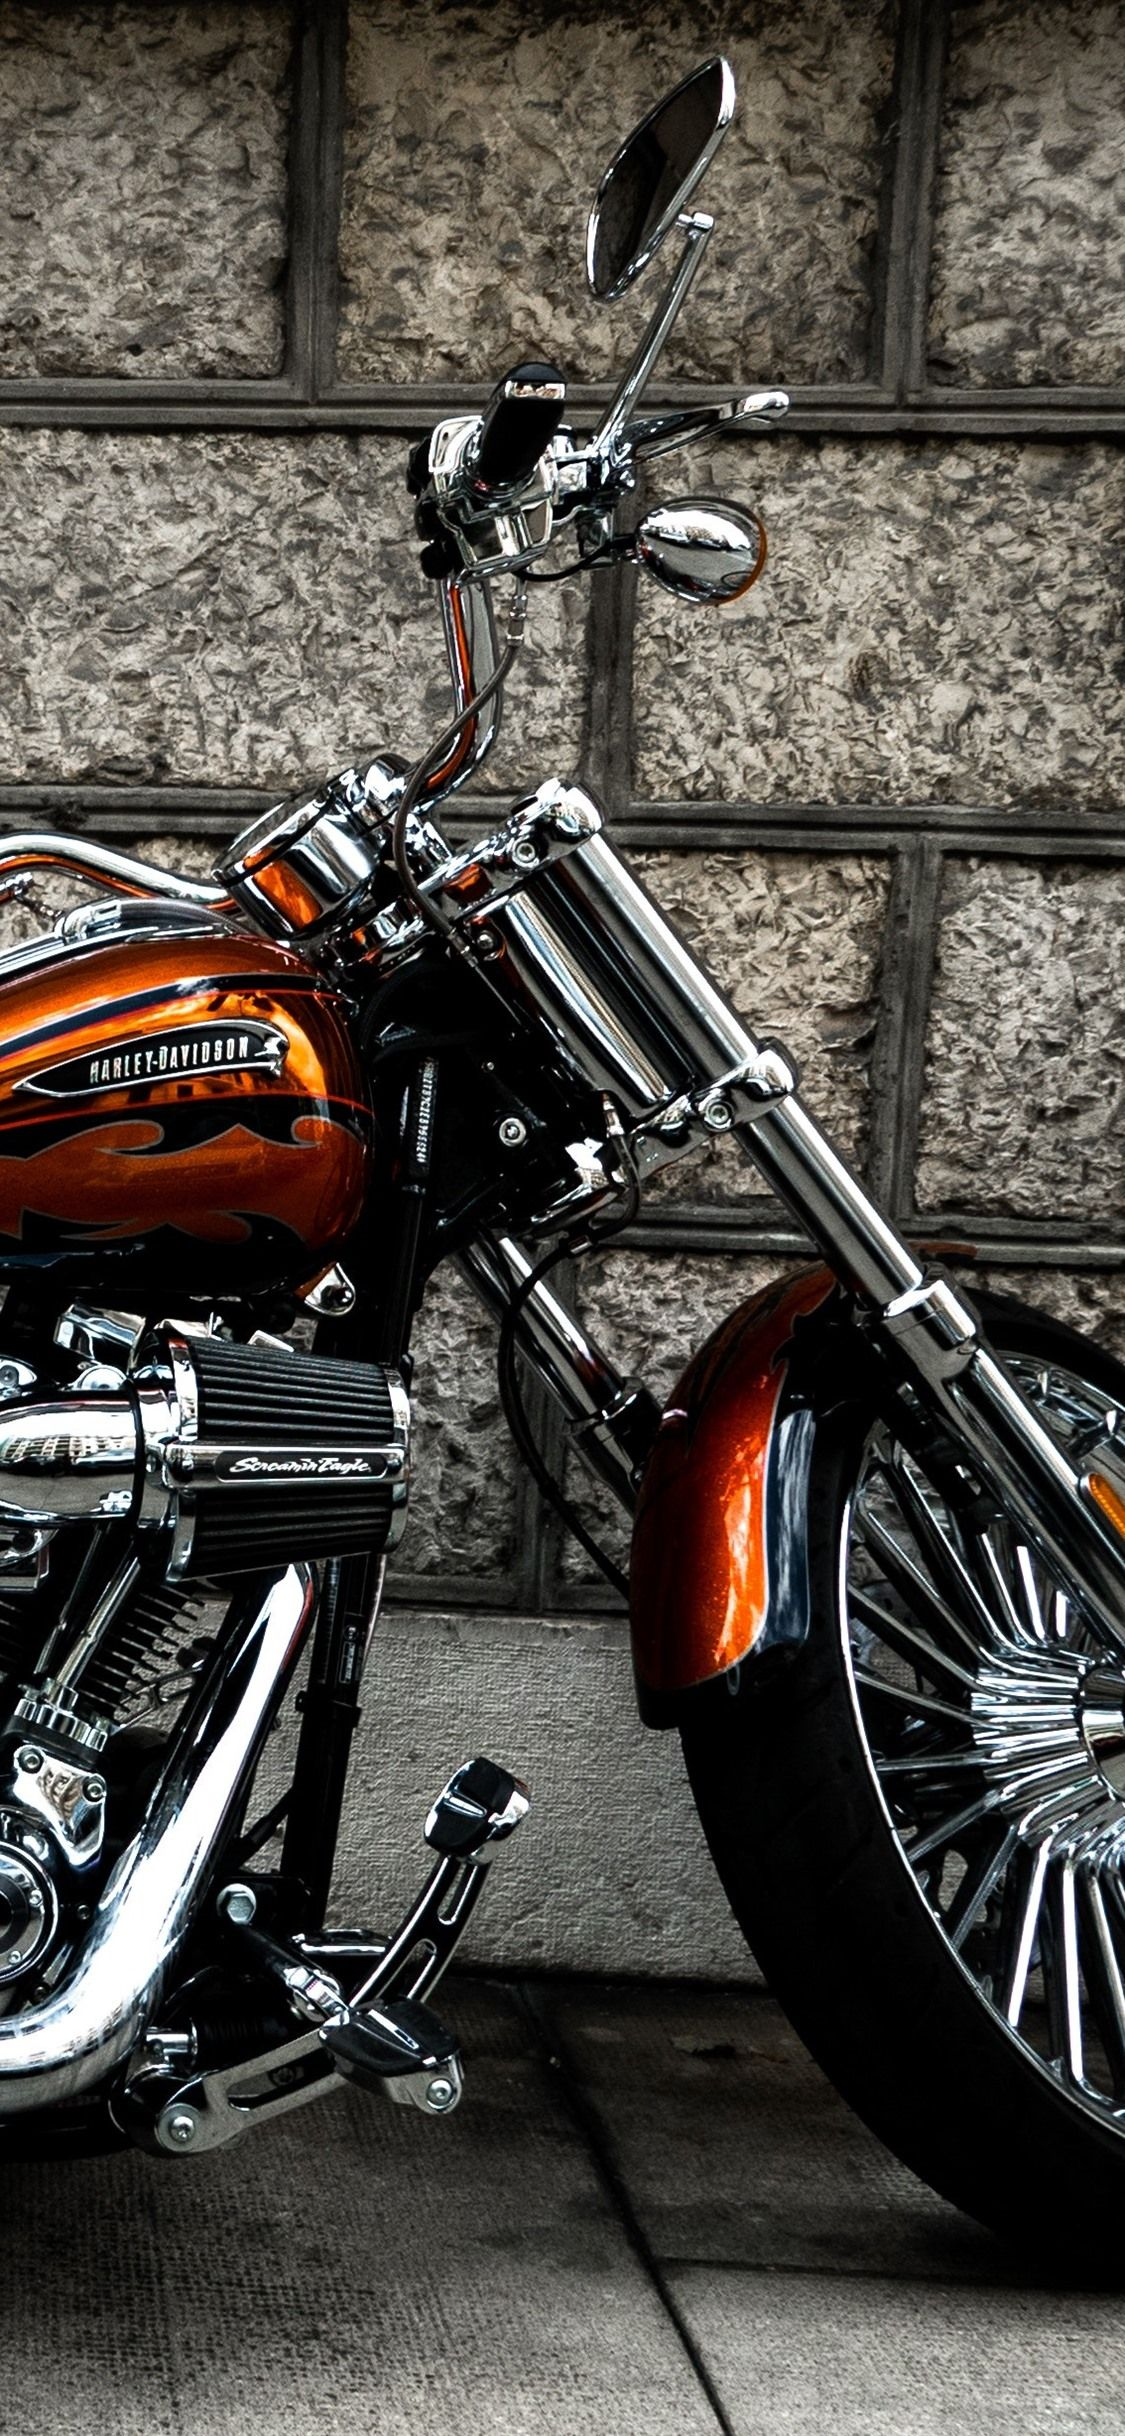 Wallpaper Harley Davidson Motorcycle Side View 3840x2160 Harleydavidson Motorcycles Wallpapers Top Free Harley A Collection Of The Top Motosikletci Kiz Kizlar